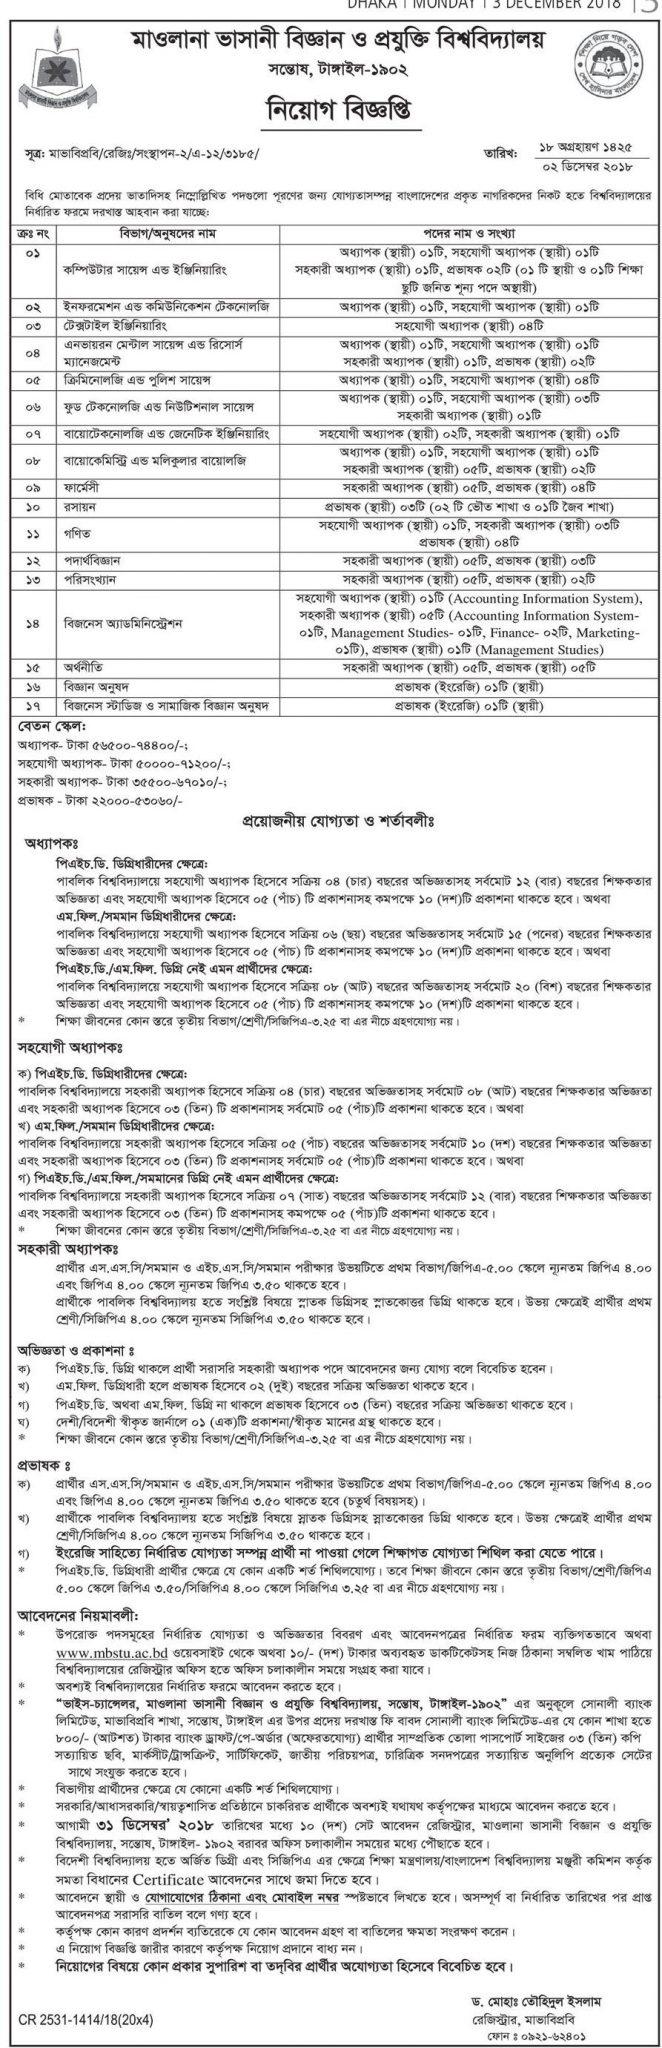 Mawlana Bhashani Science & Technology University mbstu Job Circular 2018